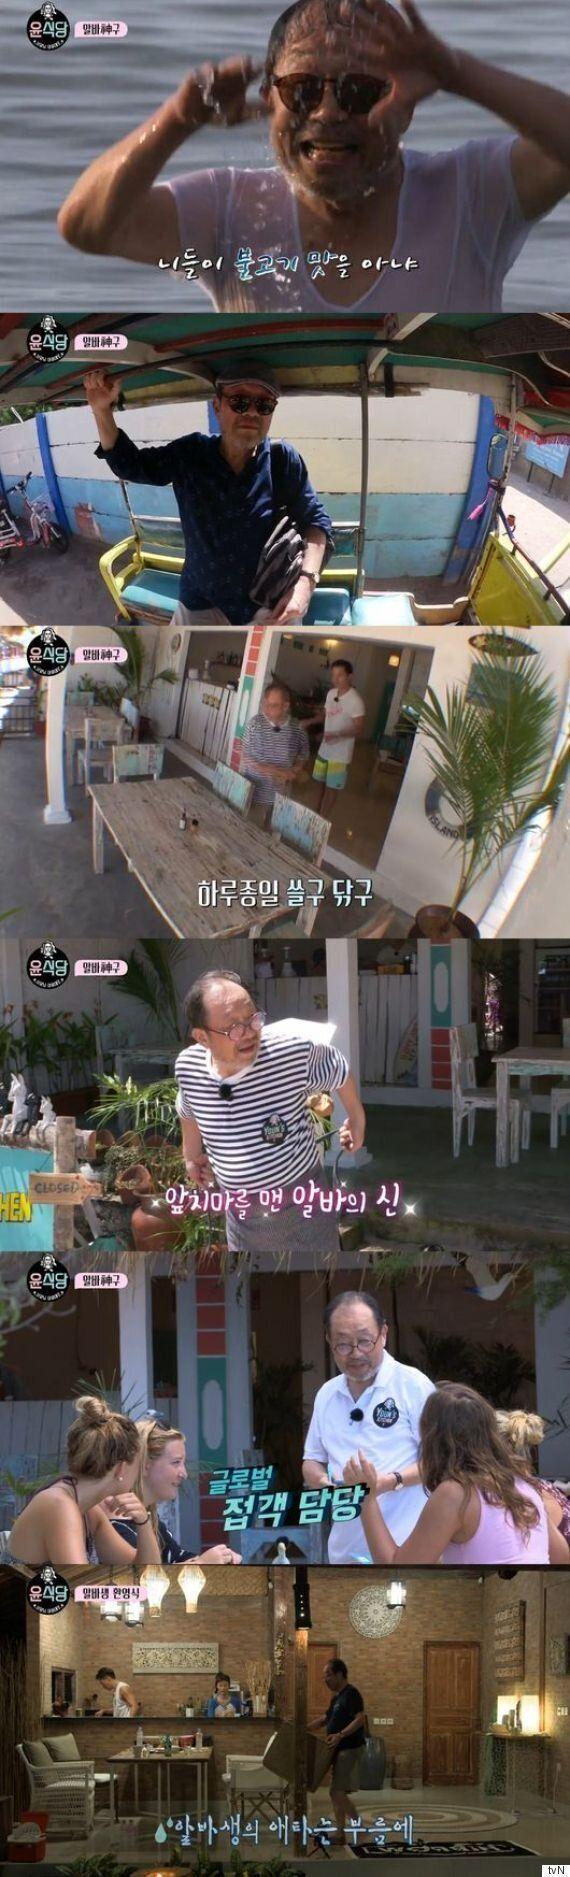 [TV톡톡] '윤식당' 구깨비 신구가 왔다, 속도 없이